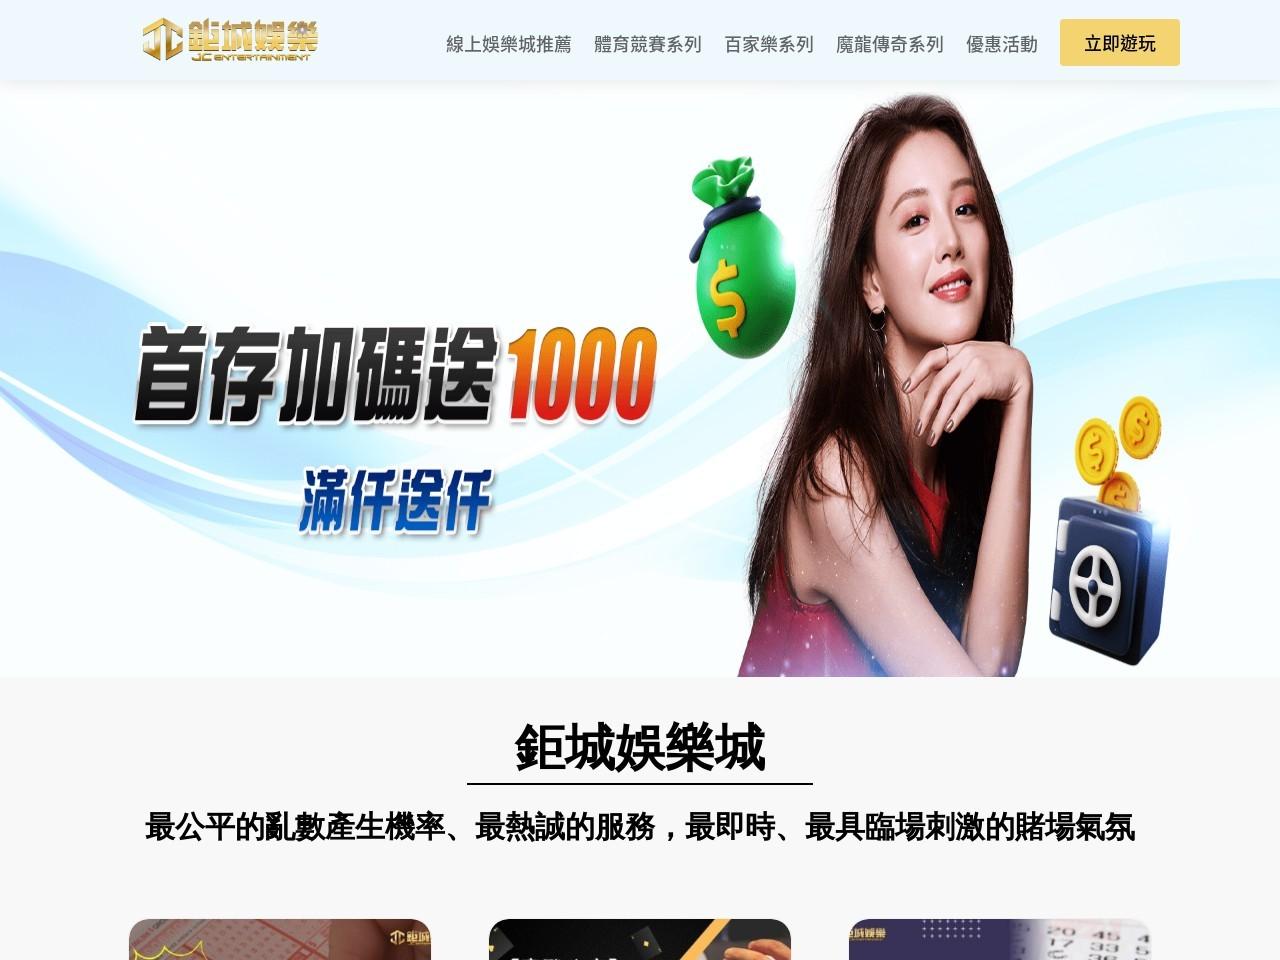 Honest and Critical Reviews of Web Hosting Services at WebsiteHostCritic.com